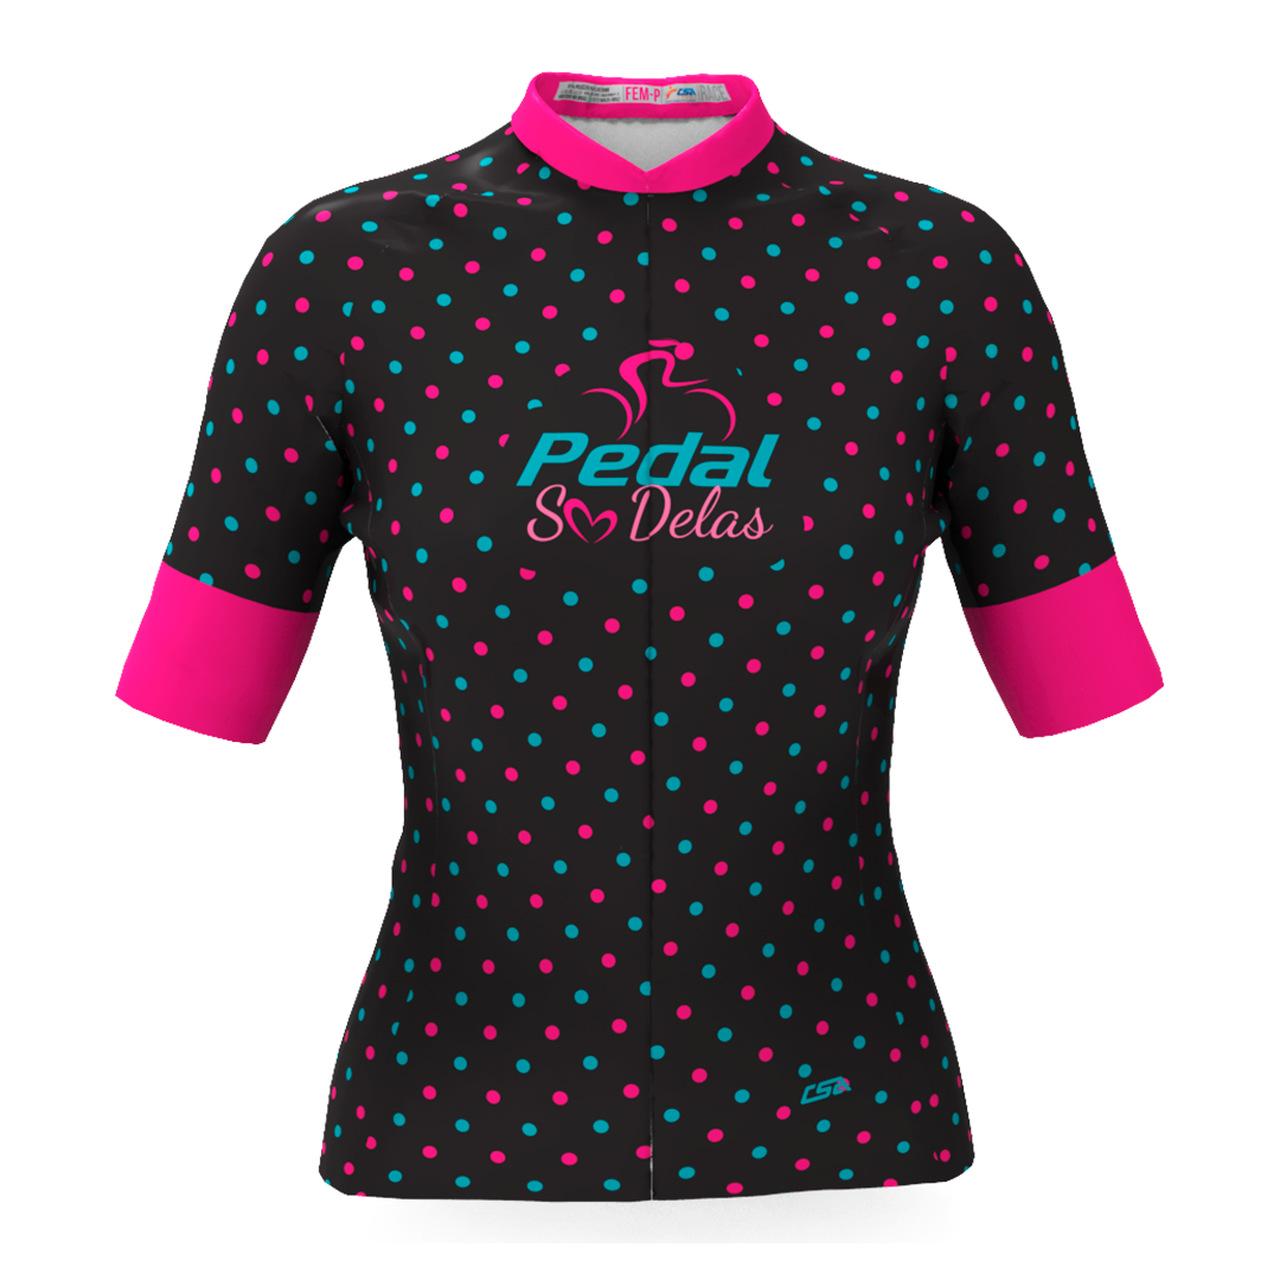 Camisa Ciclista Race Pedal Só Delas Feminina Preto-Poá